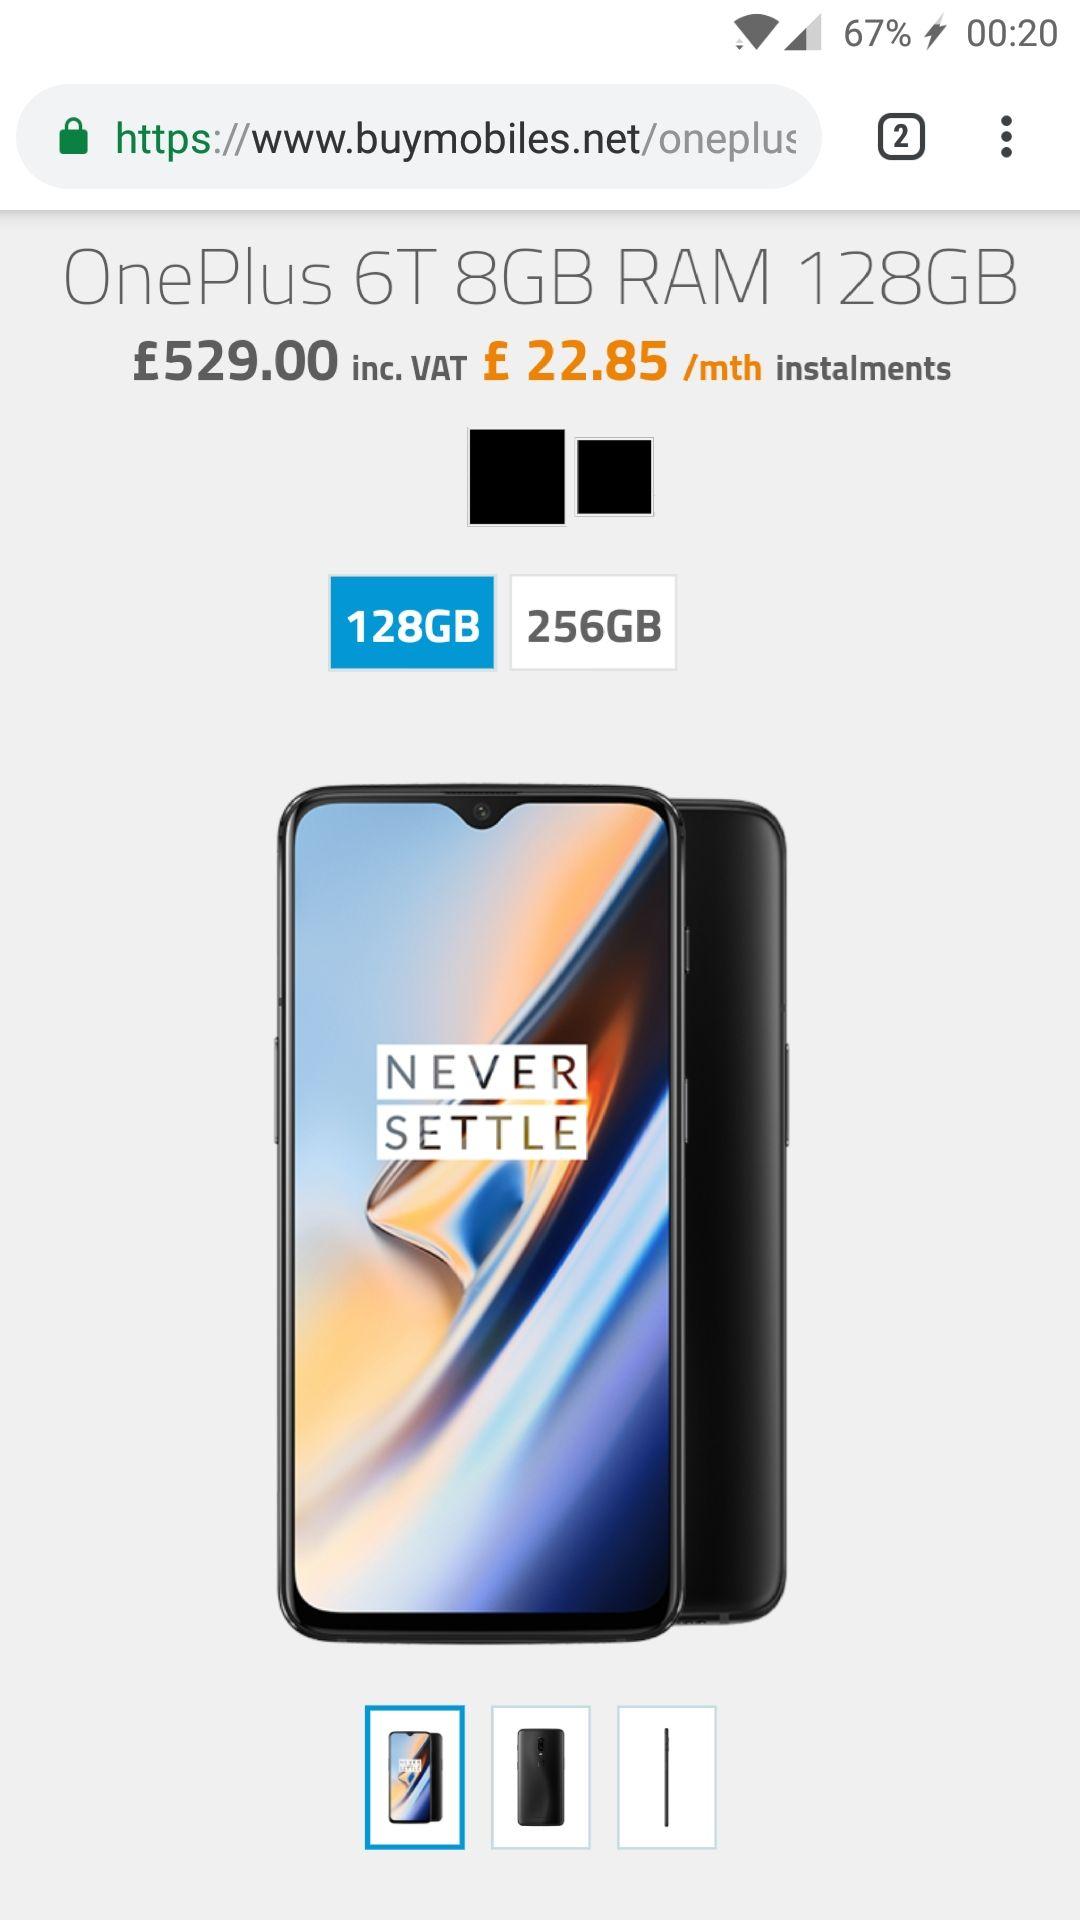 Oneplus 6t 8GB RAM Midnight or Mirror Black 80GB data £36pm / 24mth £864 before cashback @ BuyMobiles